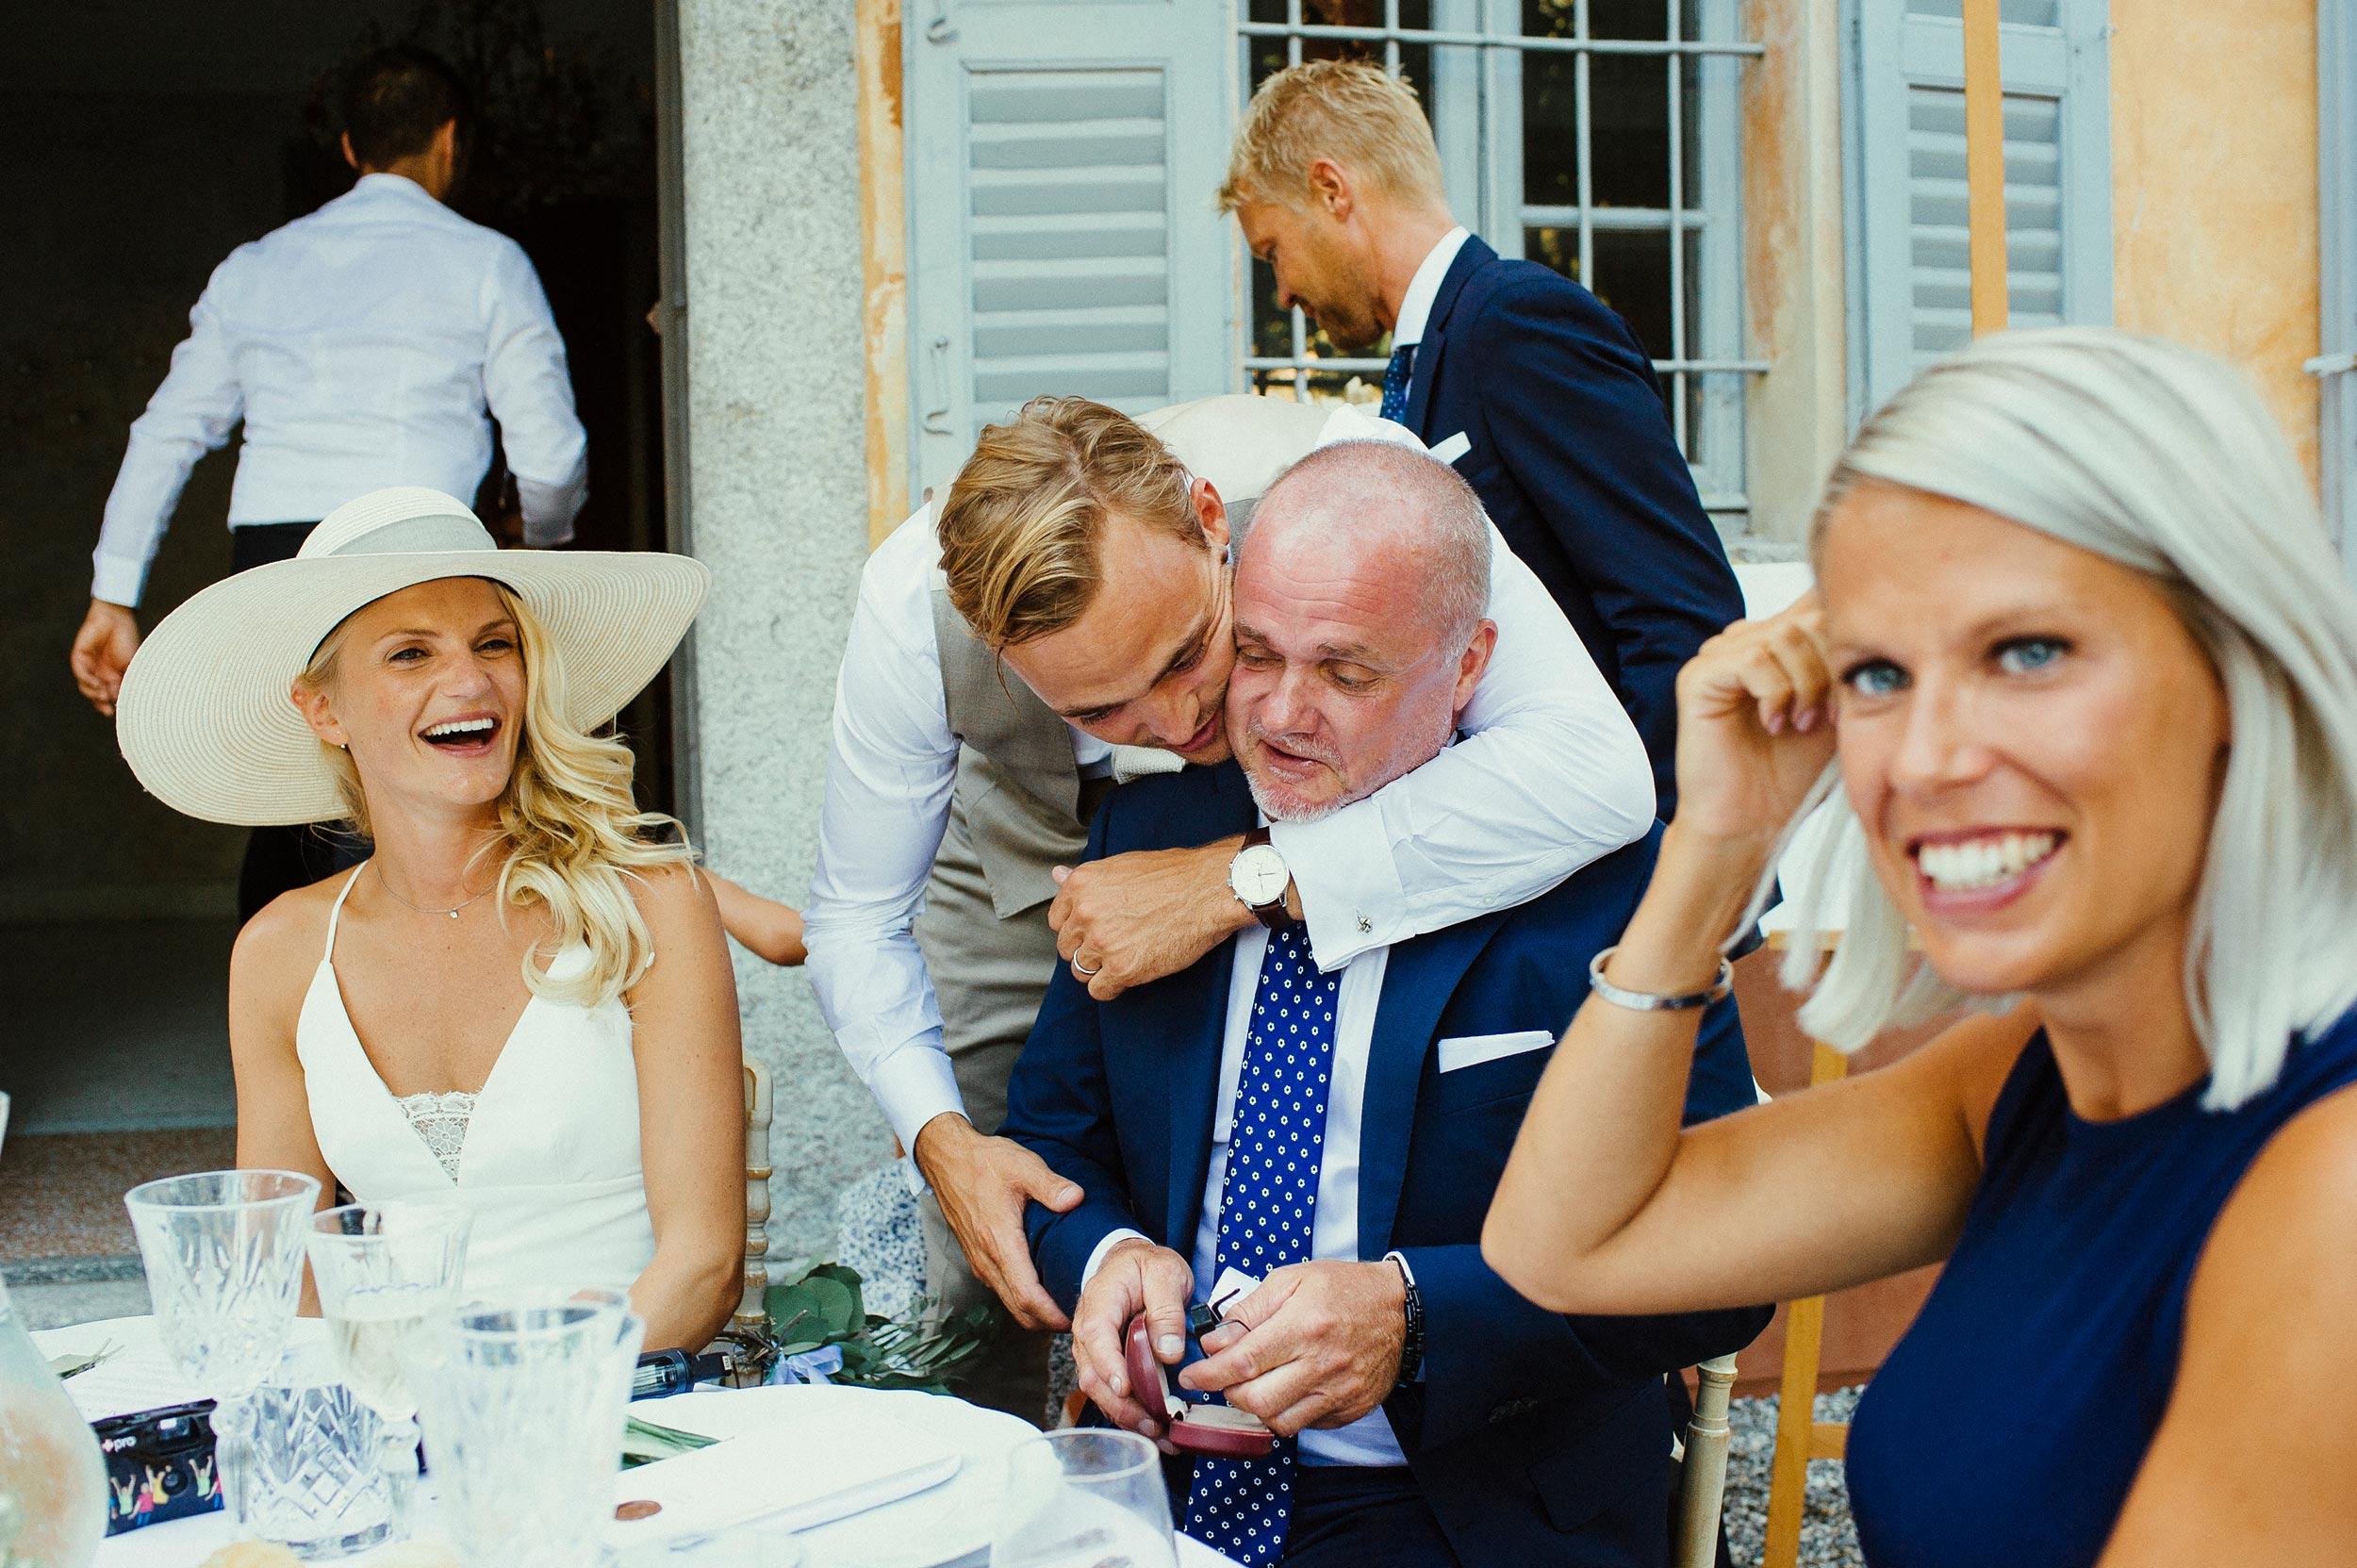 2018-Villa-Regina-Teodolinda-Lake-Como-Wedding-Photographer-Italy-Alessandro-Avenali-250.jpg